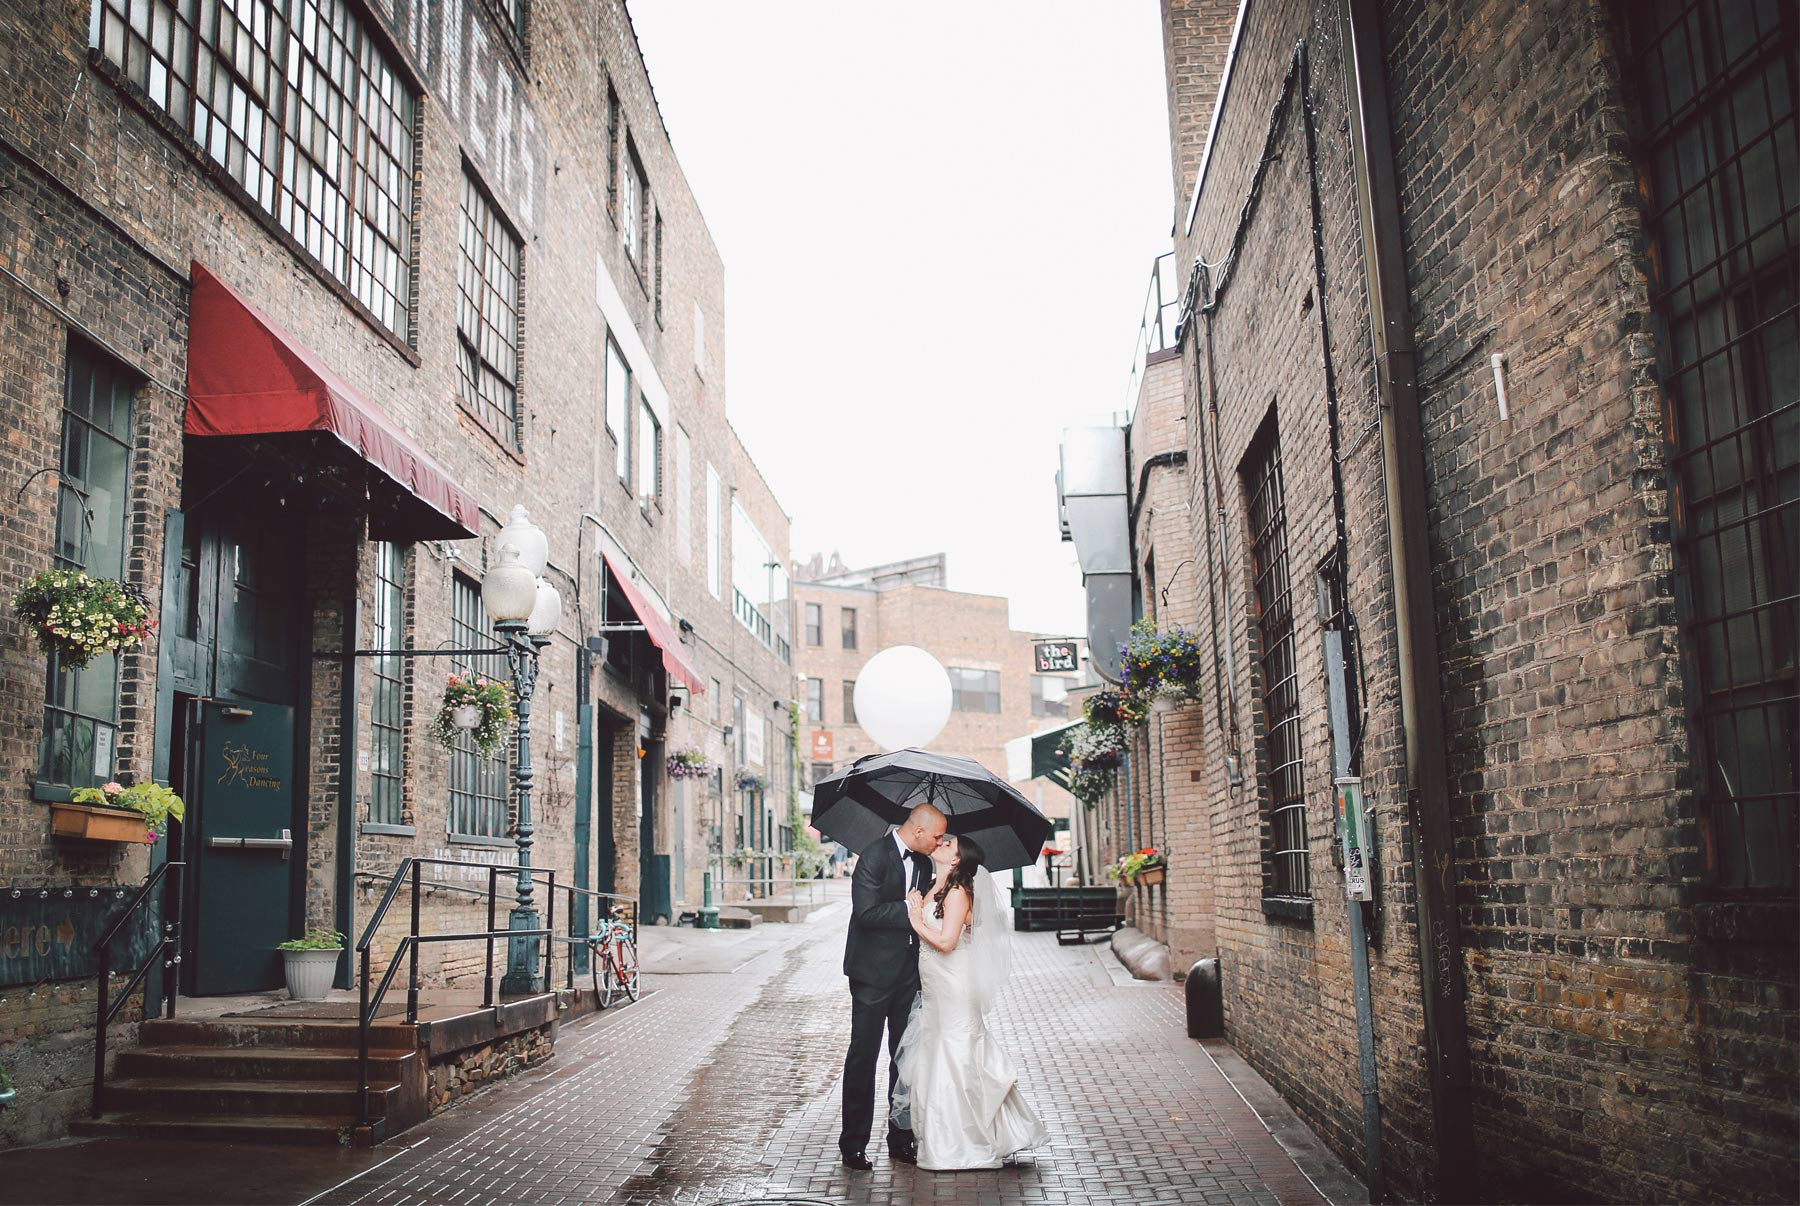 10-Minneapolis-Minnesota-Wedding-Photography-by-Vick-Photography-Rain-Umbrella-Downtown-Industrial-Brick-Nikki-and-Matt.jpg